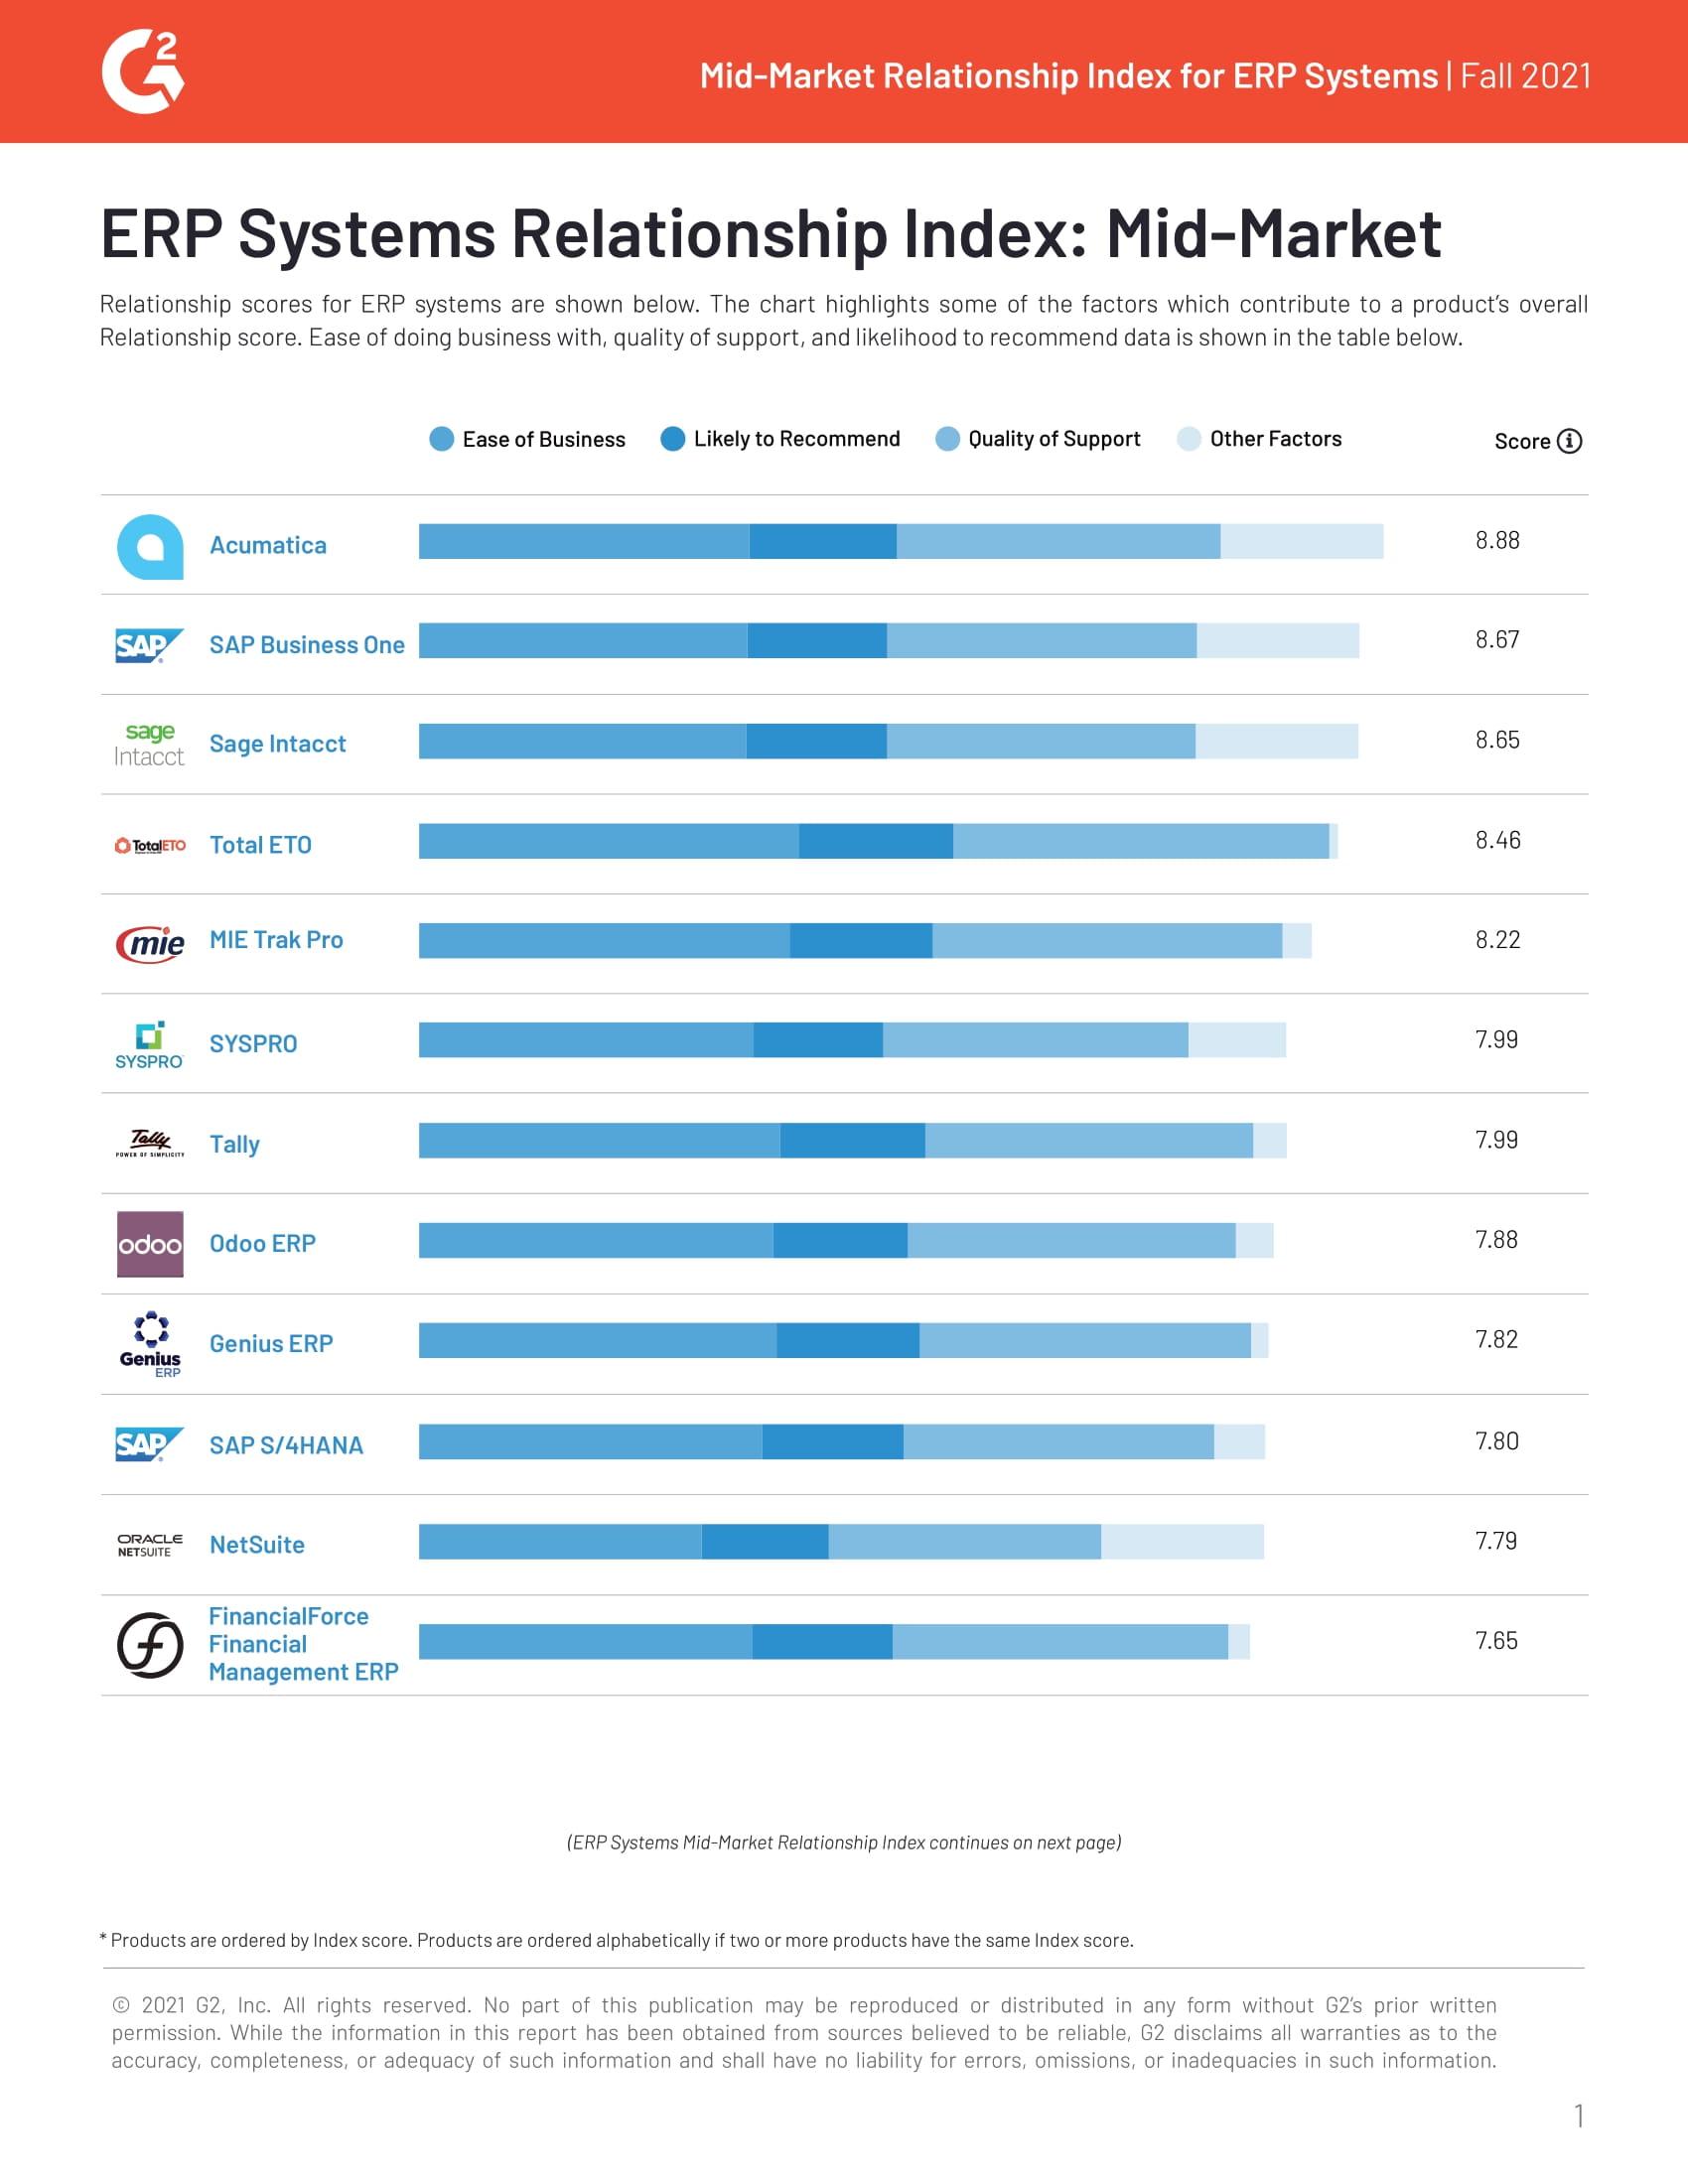 Acumatica Ranks #1 in Mid-Market Relationship Index